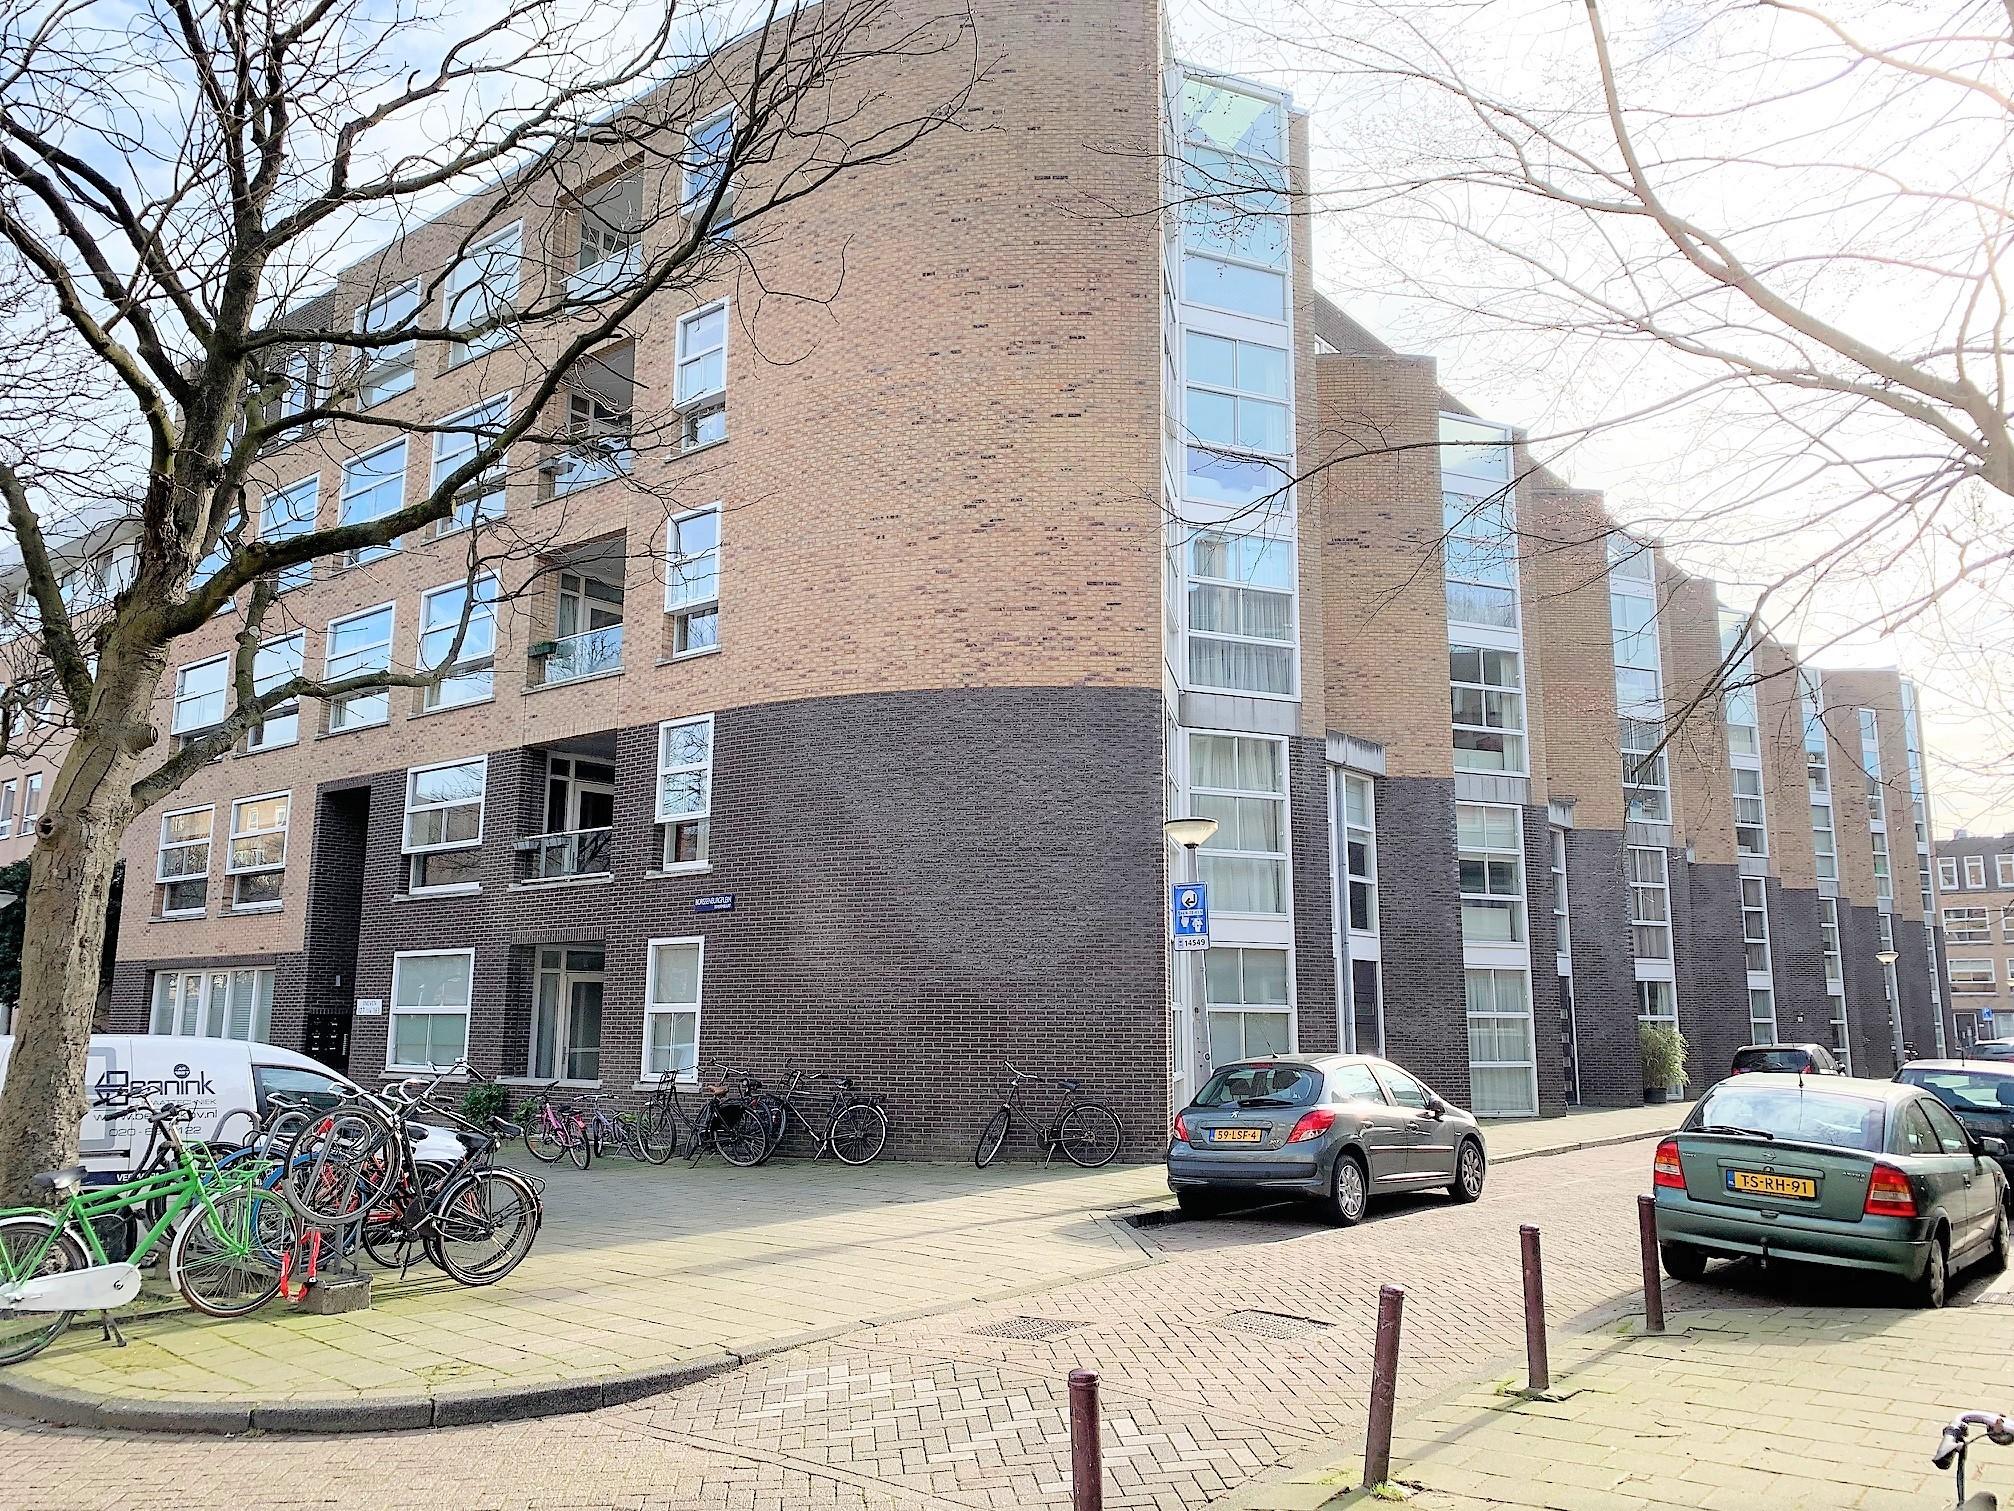 Borssenburgplein